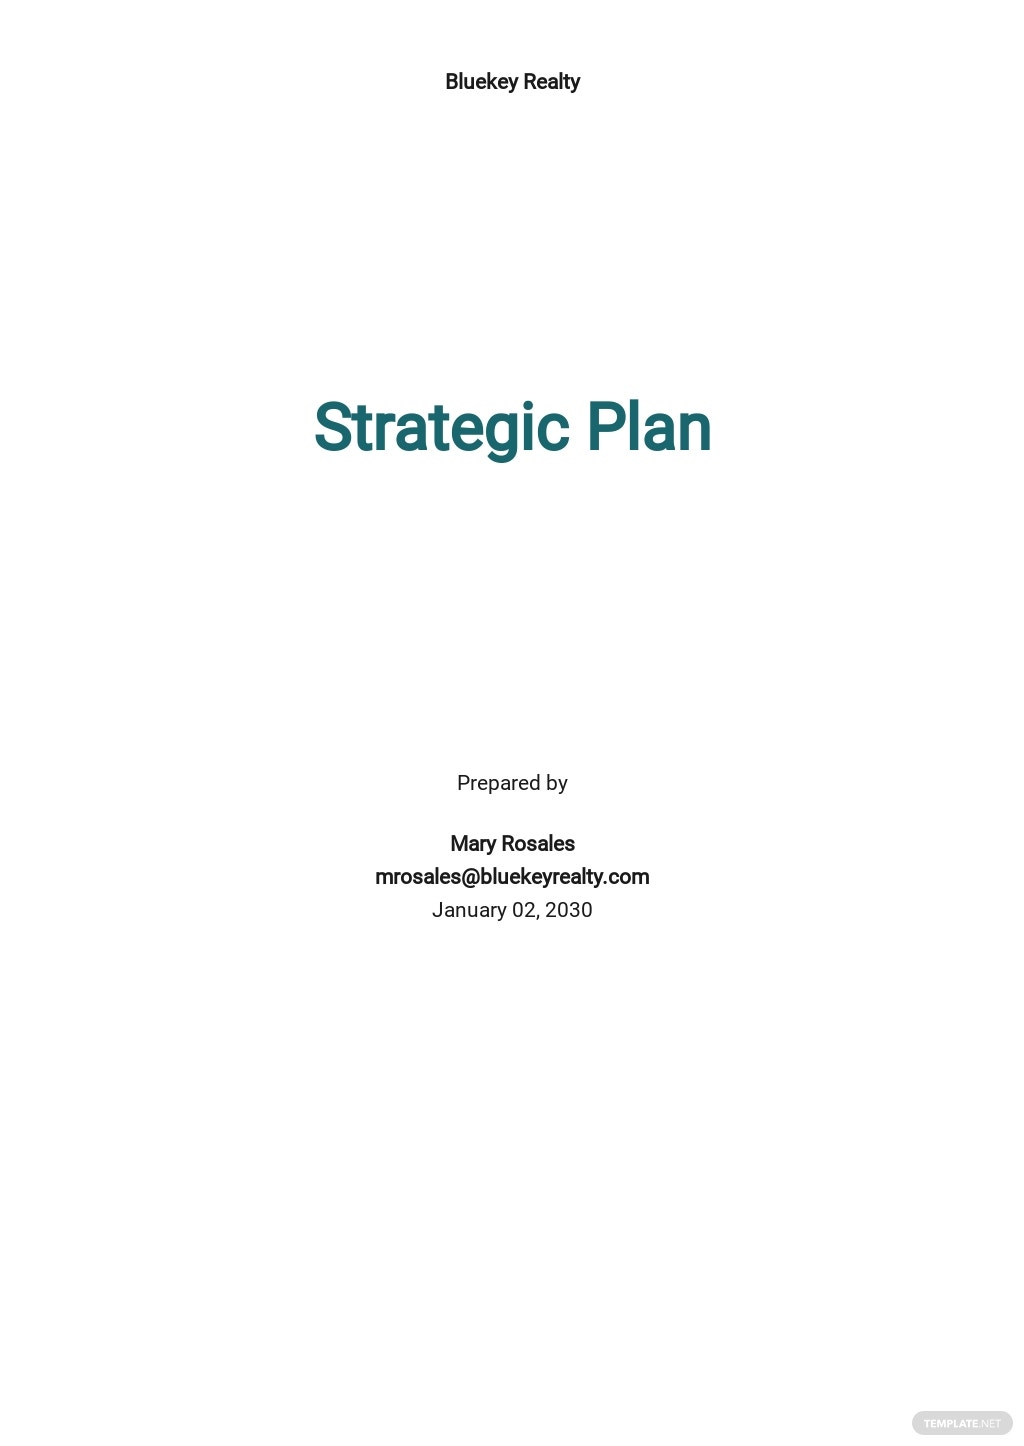 Real Estate / Property Strategic Plan Template.jpe